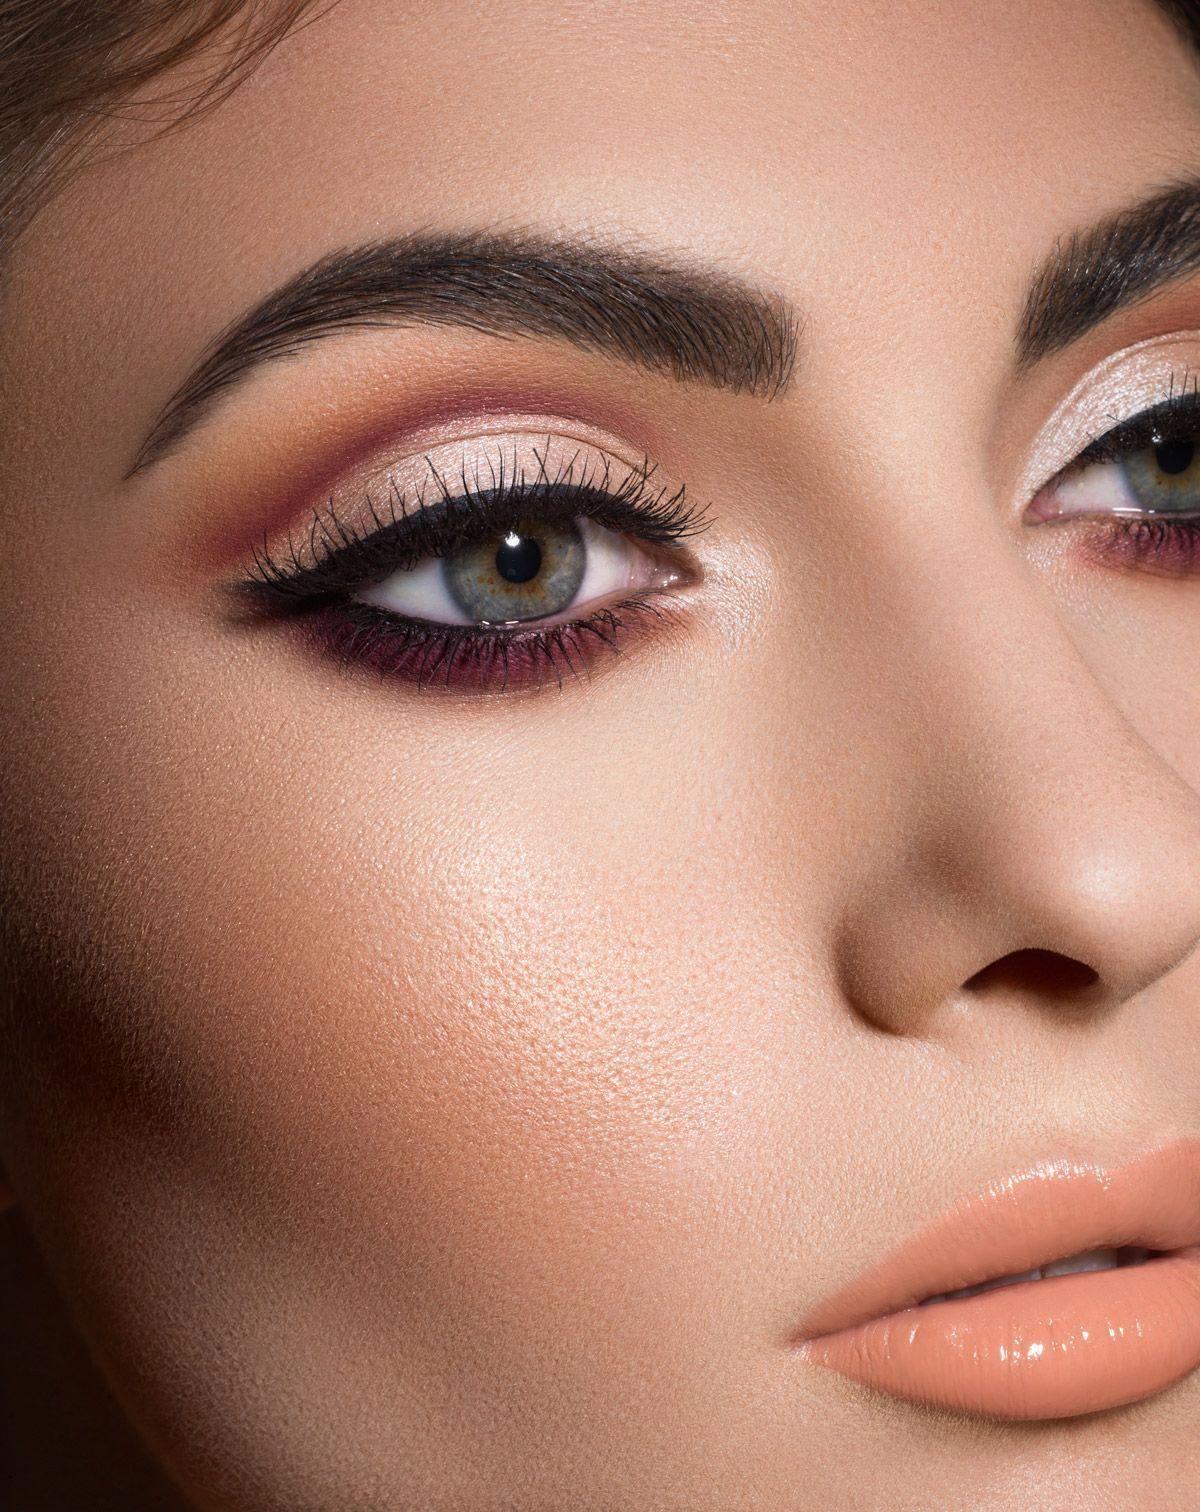 maquiagem black pink in 2020 | Renaissance eyeshadow ...